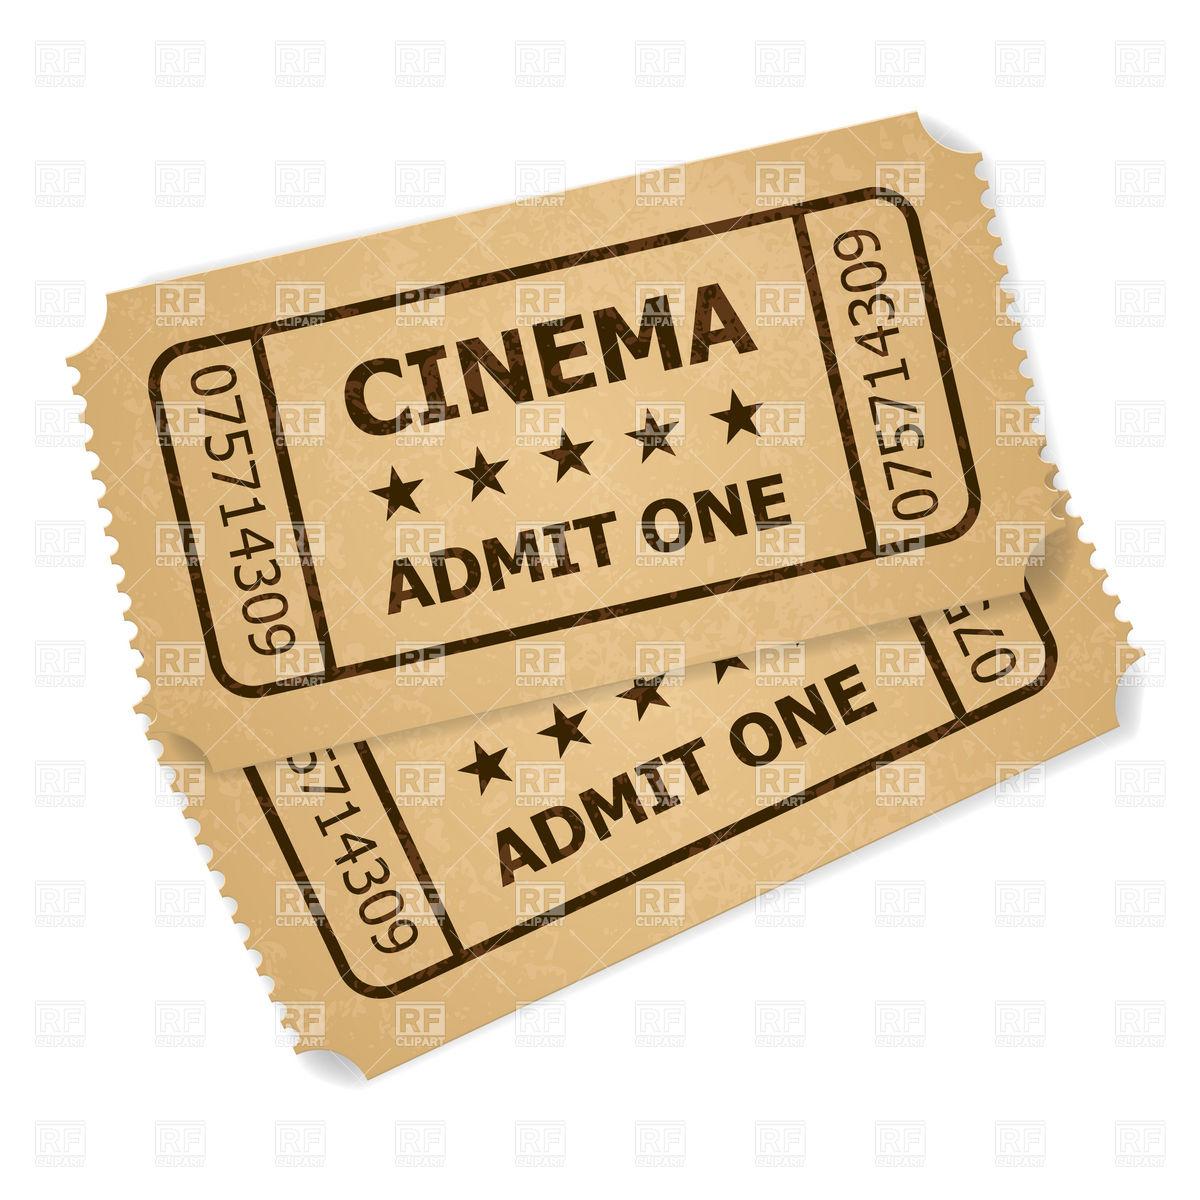 Movie Ticket Stub Clipart.